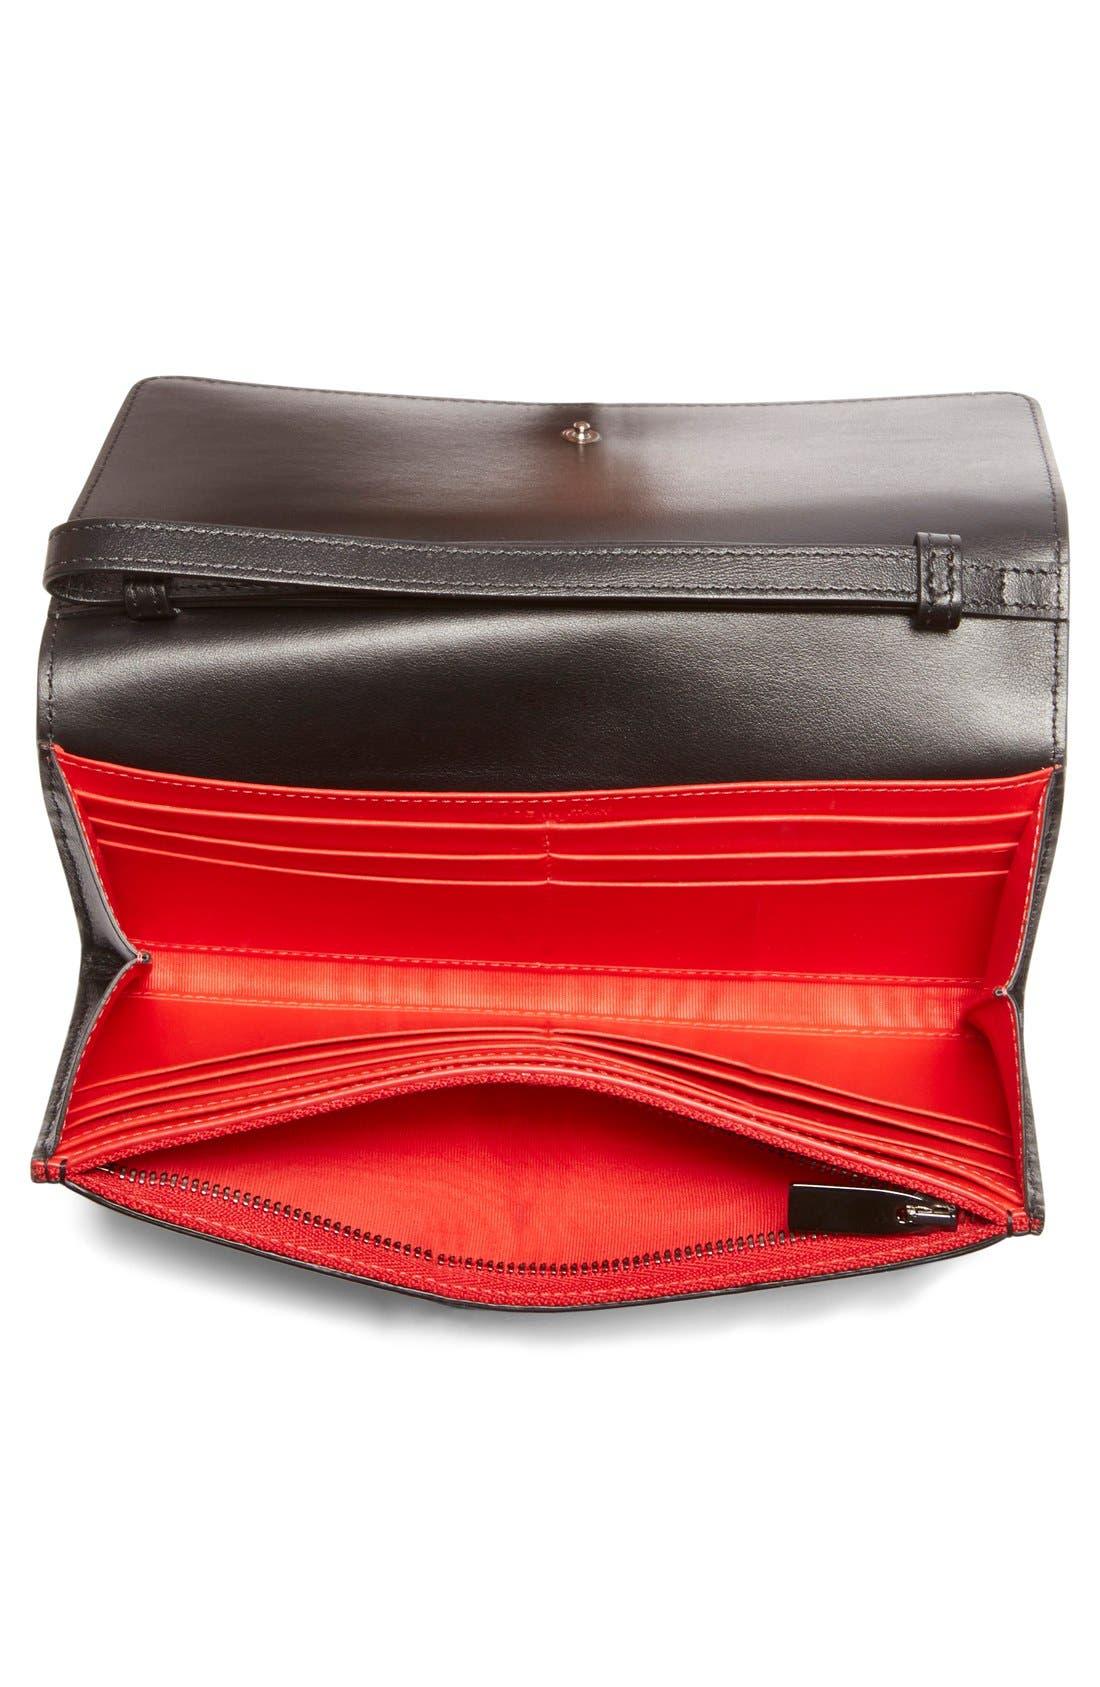 'Macaron' Studded Leather Continental Wallet,                             Alternate thumbnail 2, color,                             Black/ Gunmetal